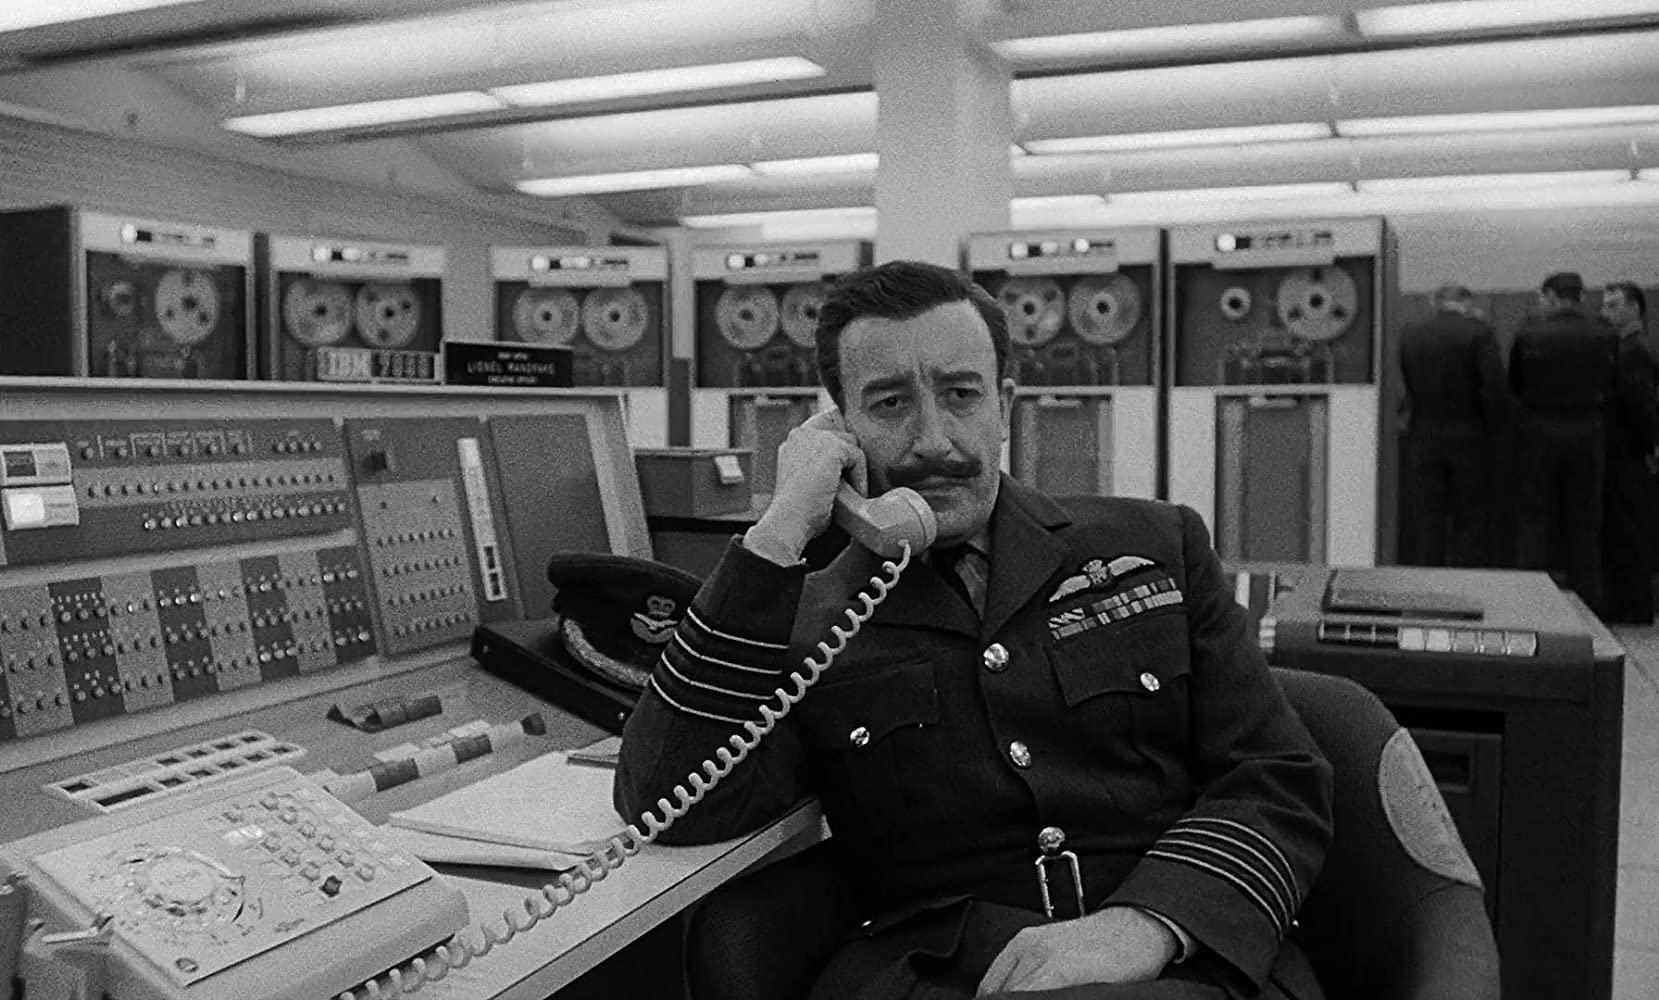 Peter Sellers in Stanley Kubrick's Dr. Strangelove